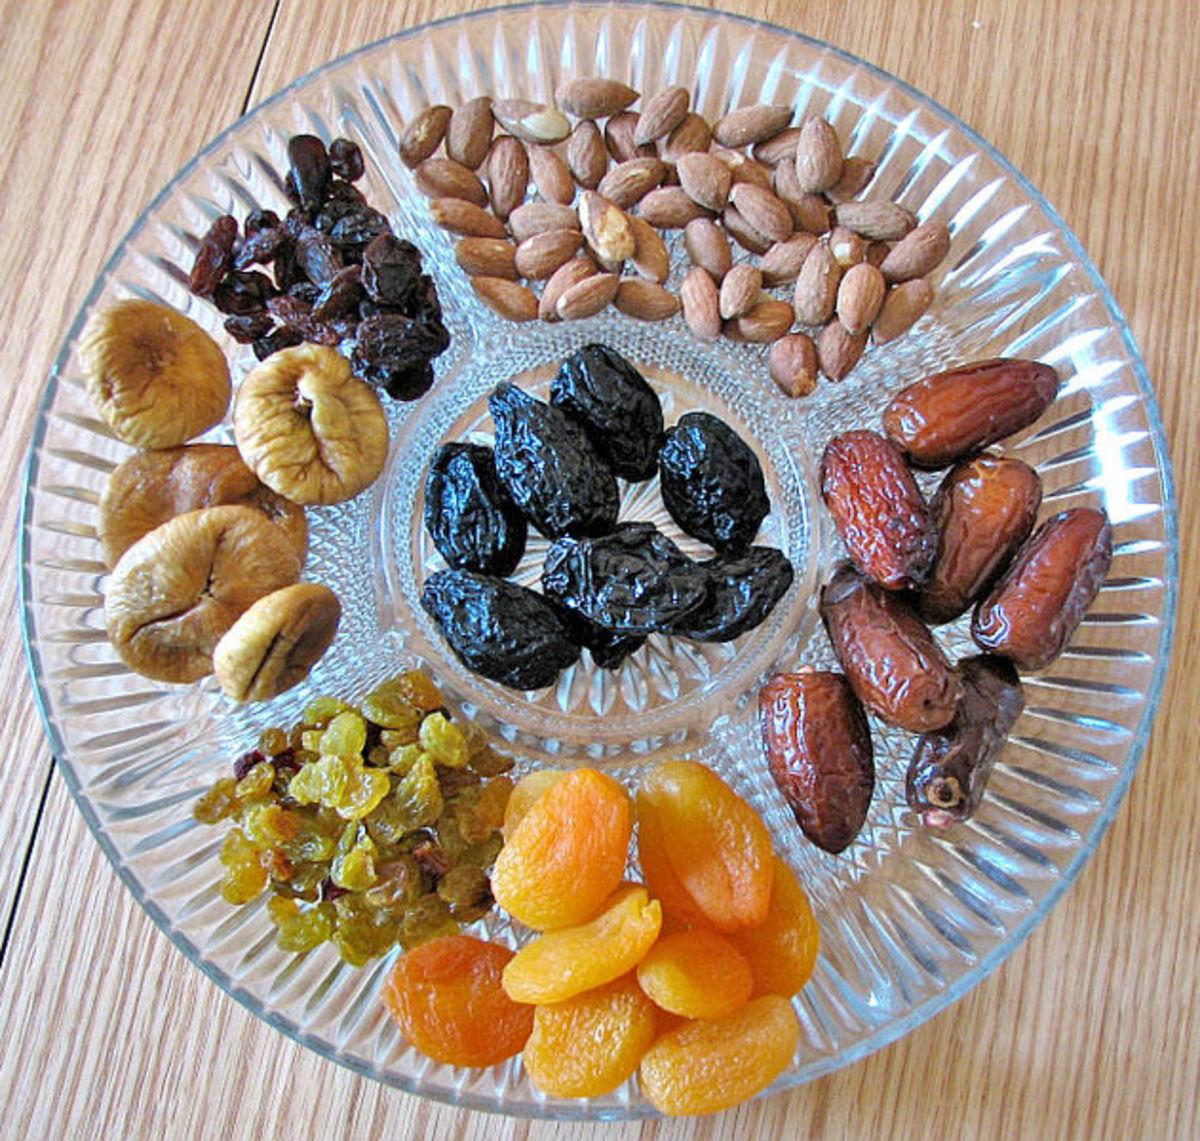 50 Quick, Low-Calorie, Filling Breakfast Ideas